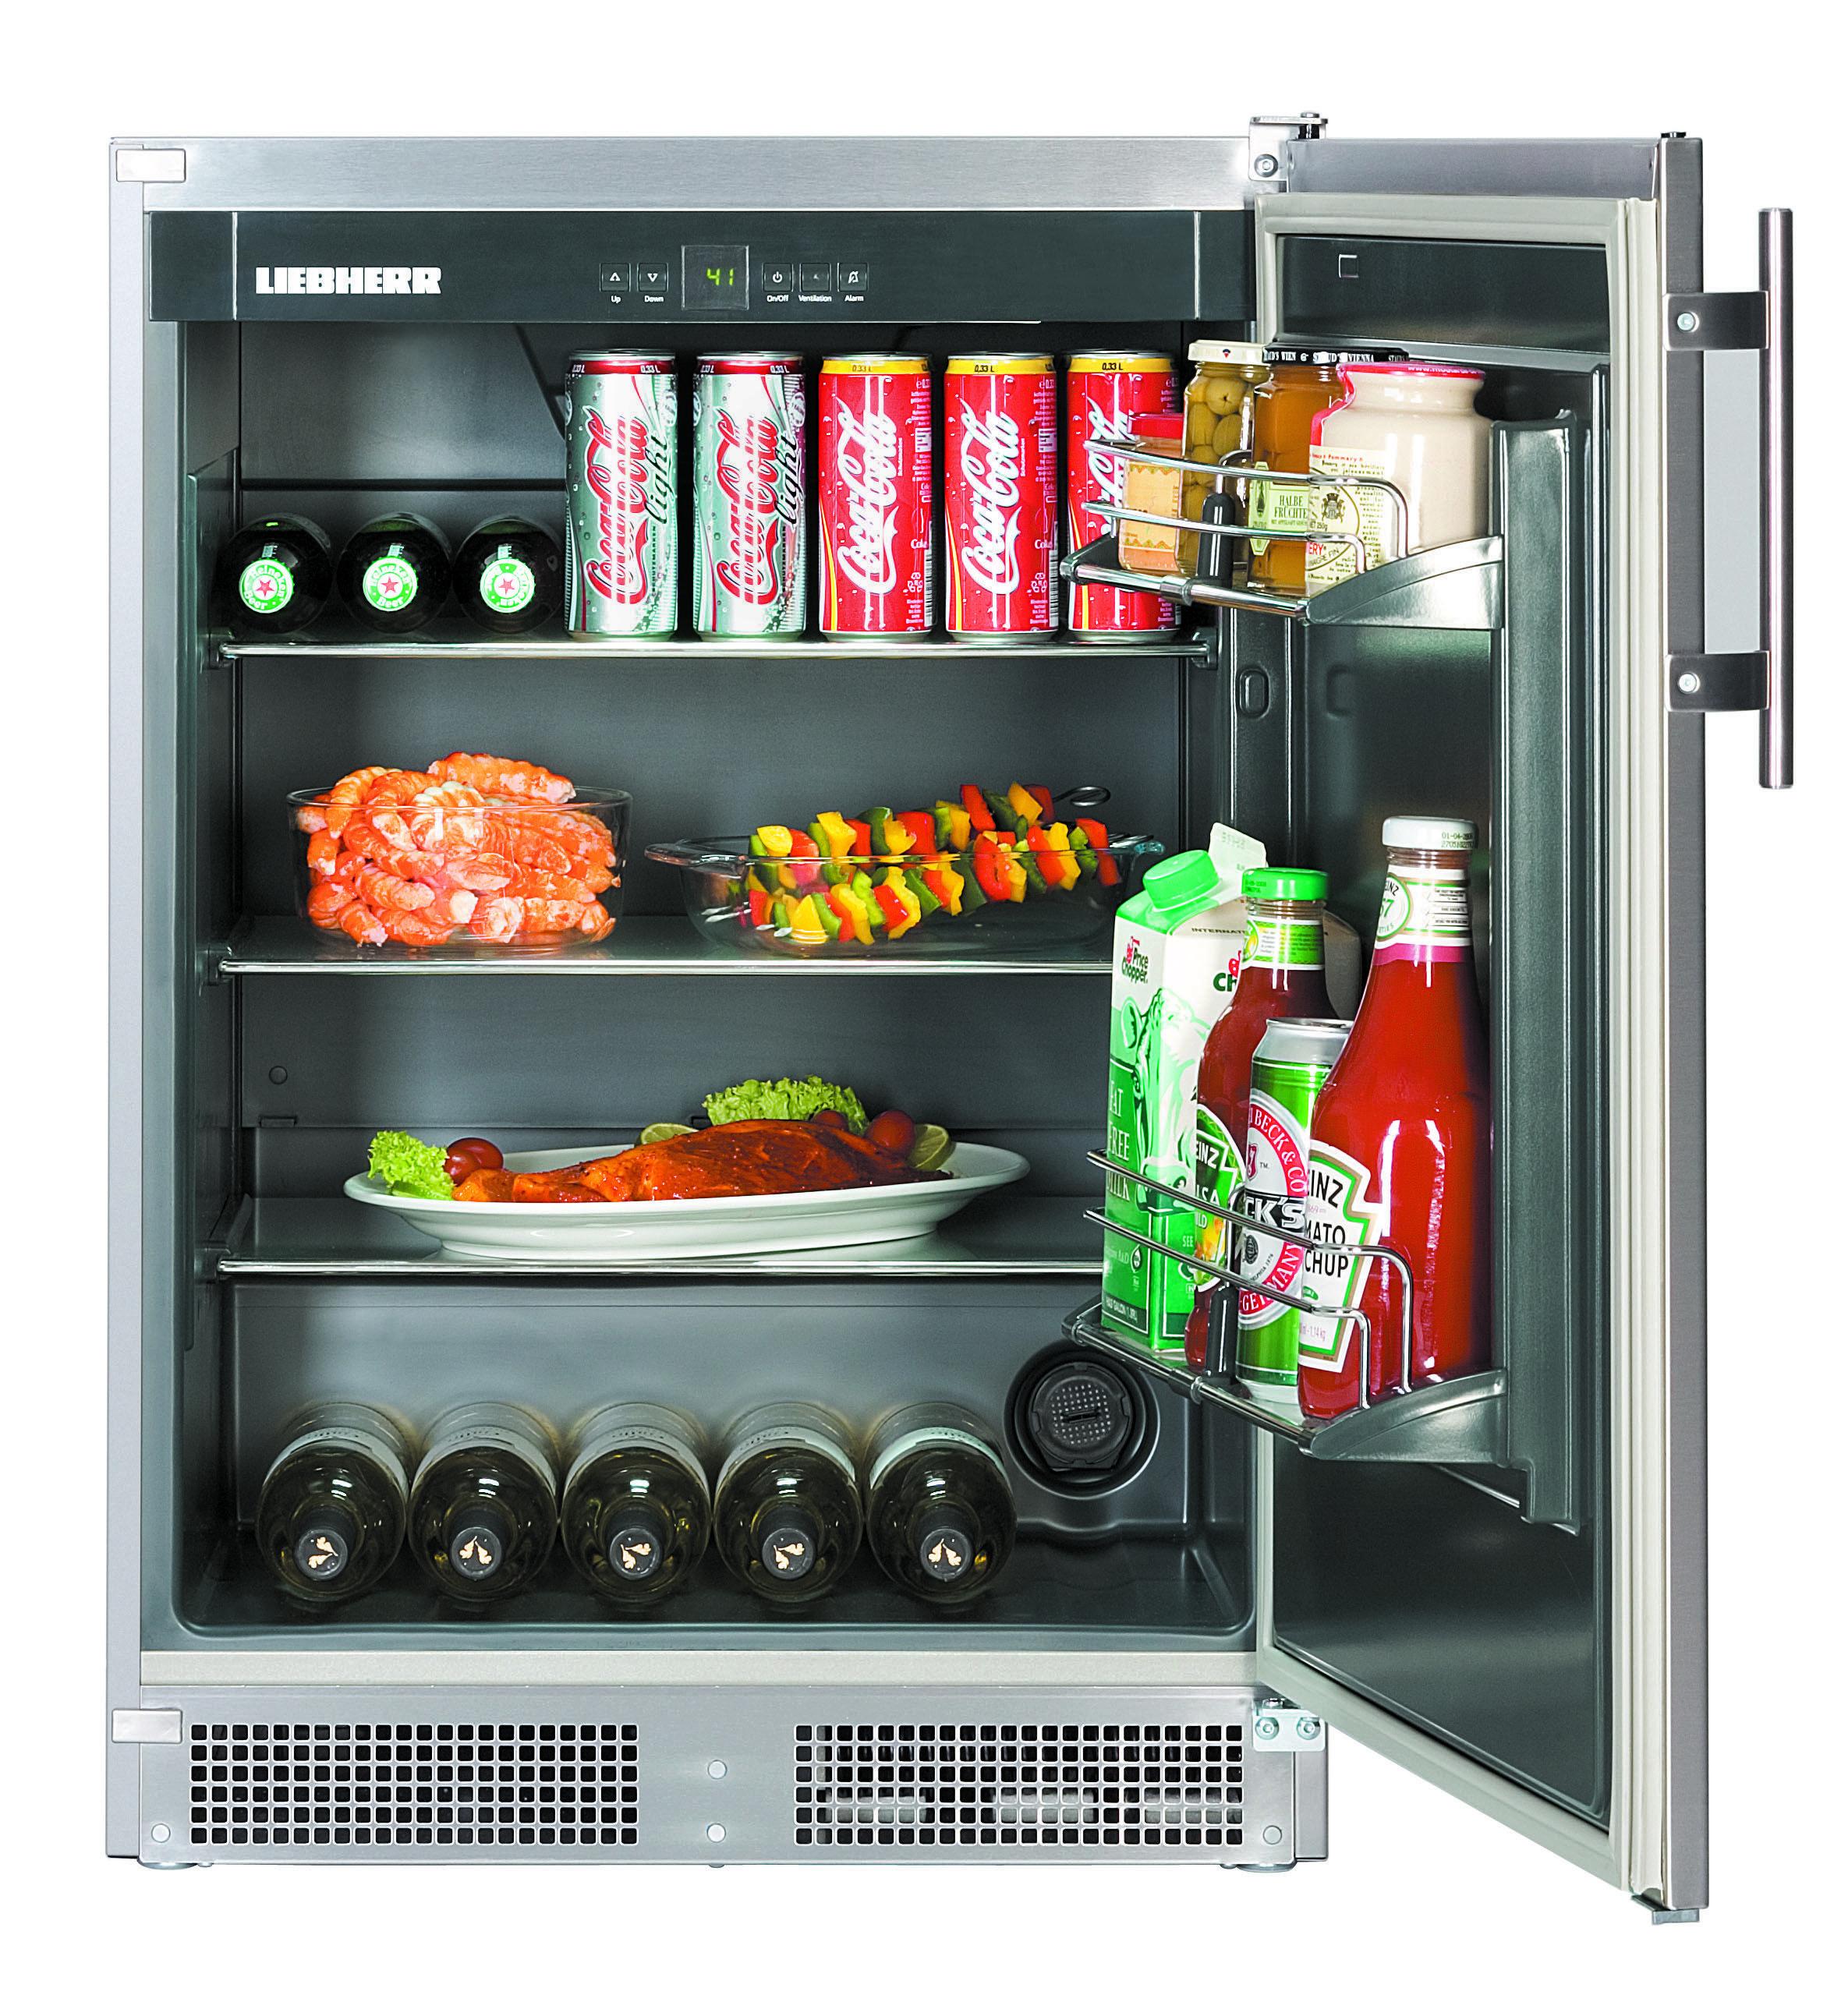 24 Outdoor Refrigerator Liebherr Ro 500 Outdoor Refrigerator Undercounter Refrigerator Outdoor Fridge